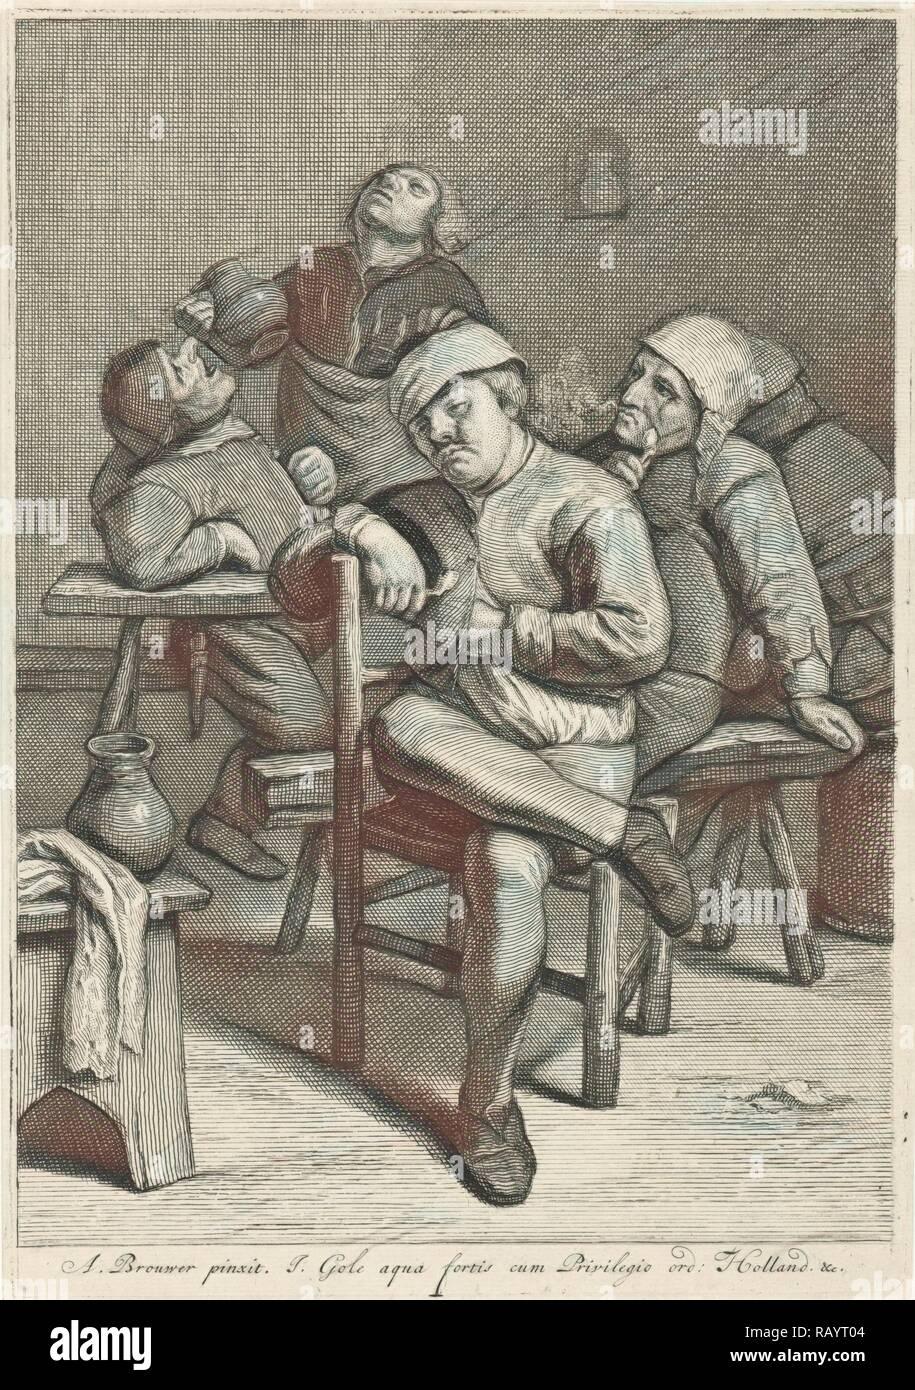 Tavern Scene with smoking farmers, Jacob Gole, Republiek der Zeven Verenigde Nederlanden, 1670 - 1724. Reimagined - Stock Image